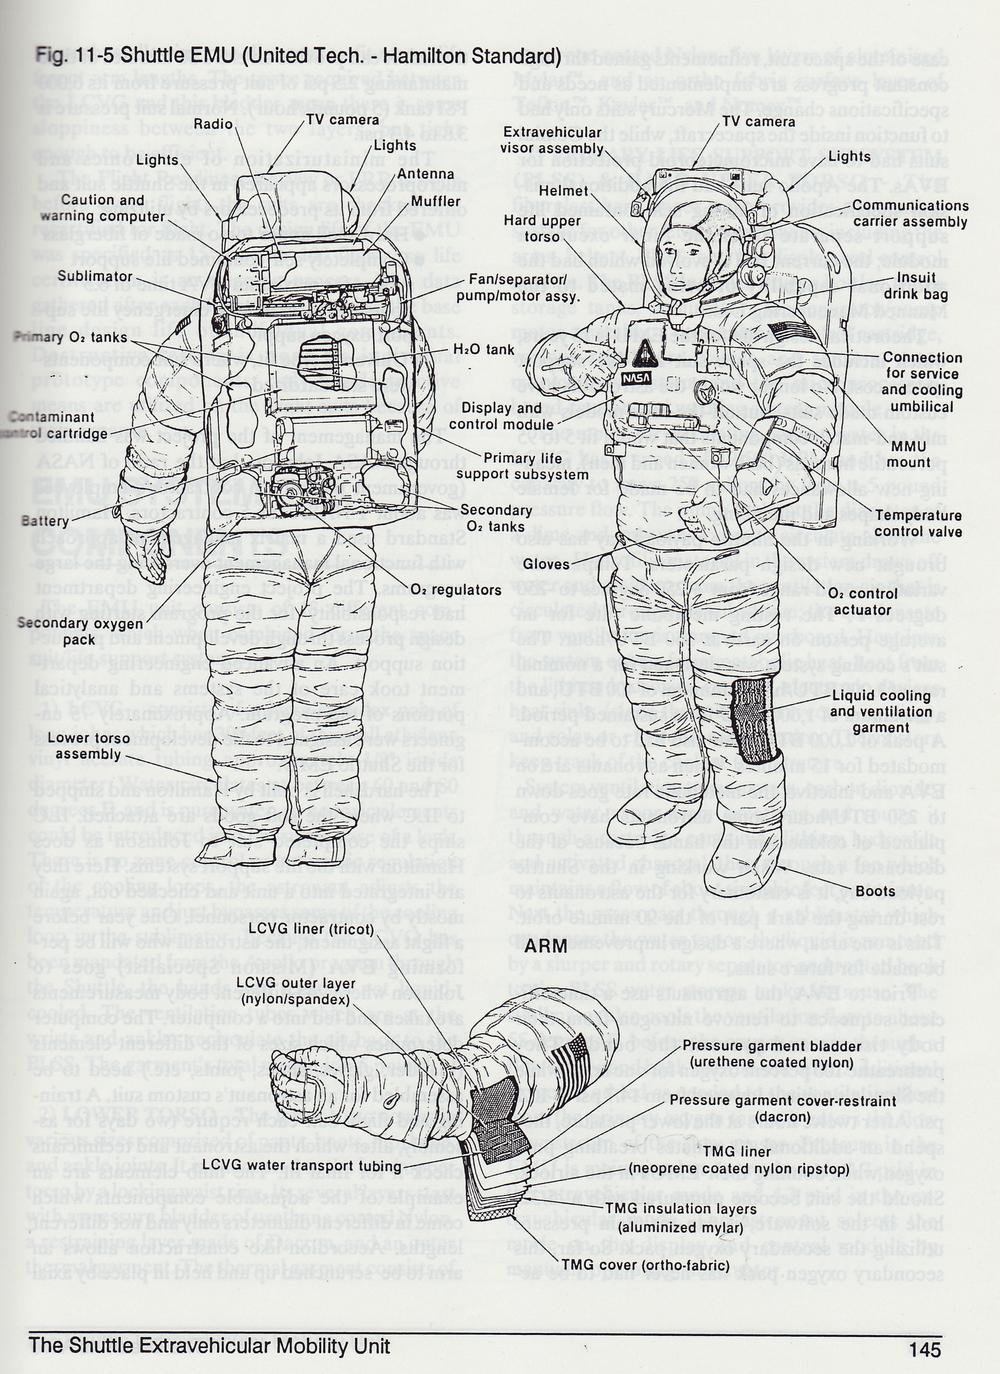 Astronaut(2).jpg